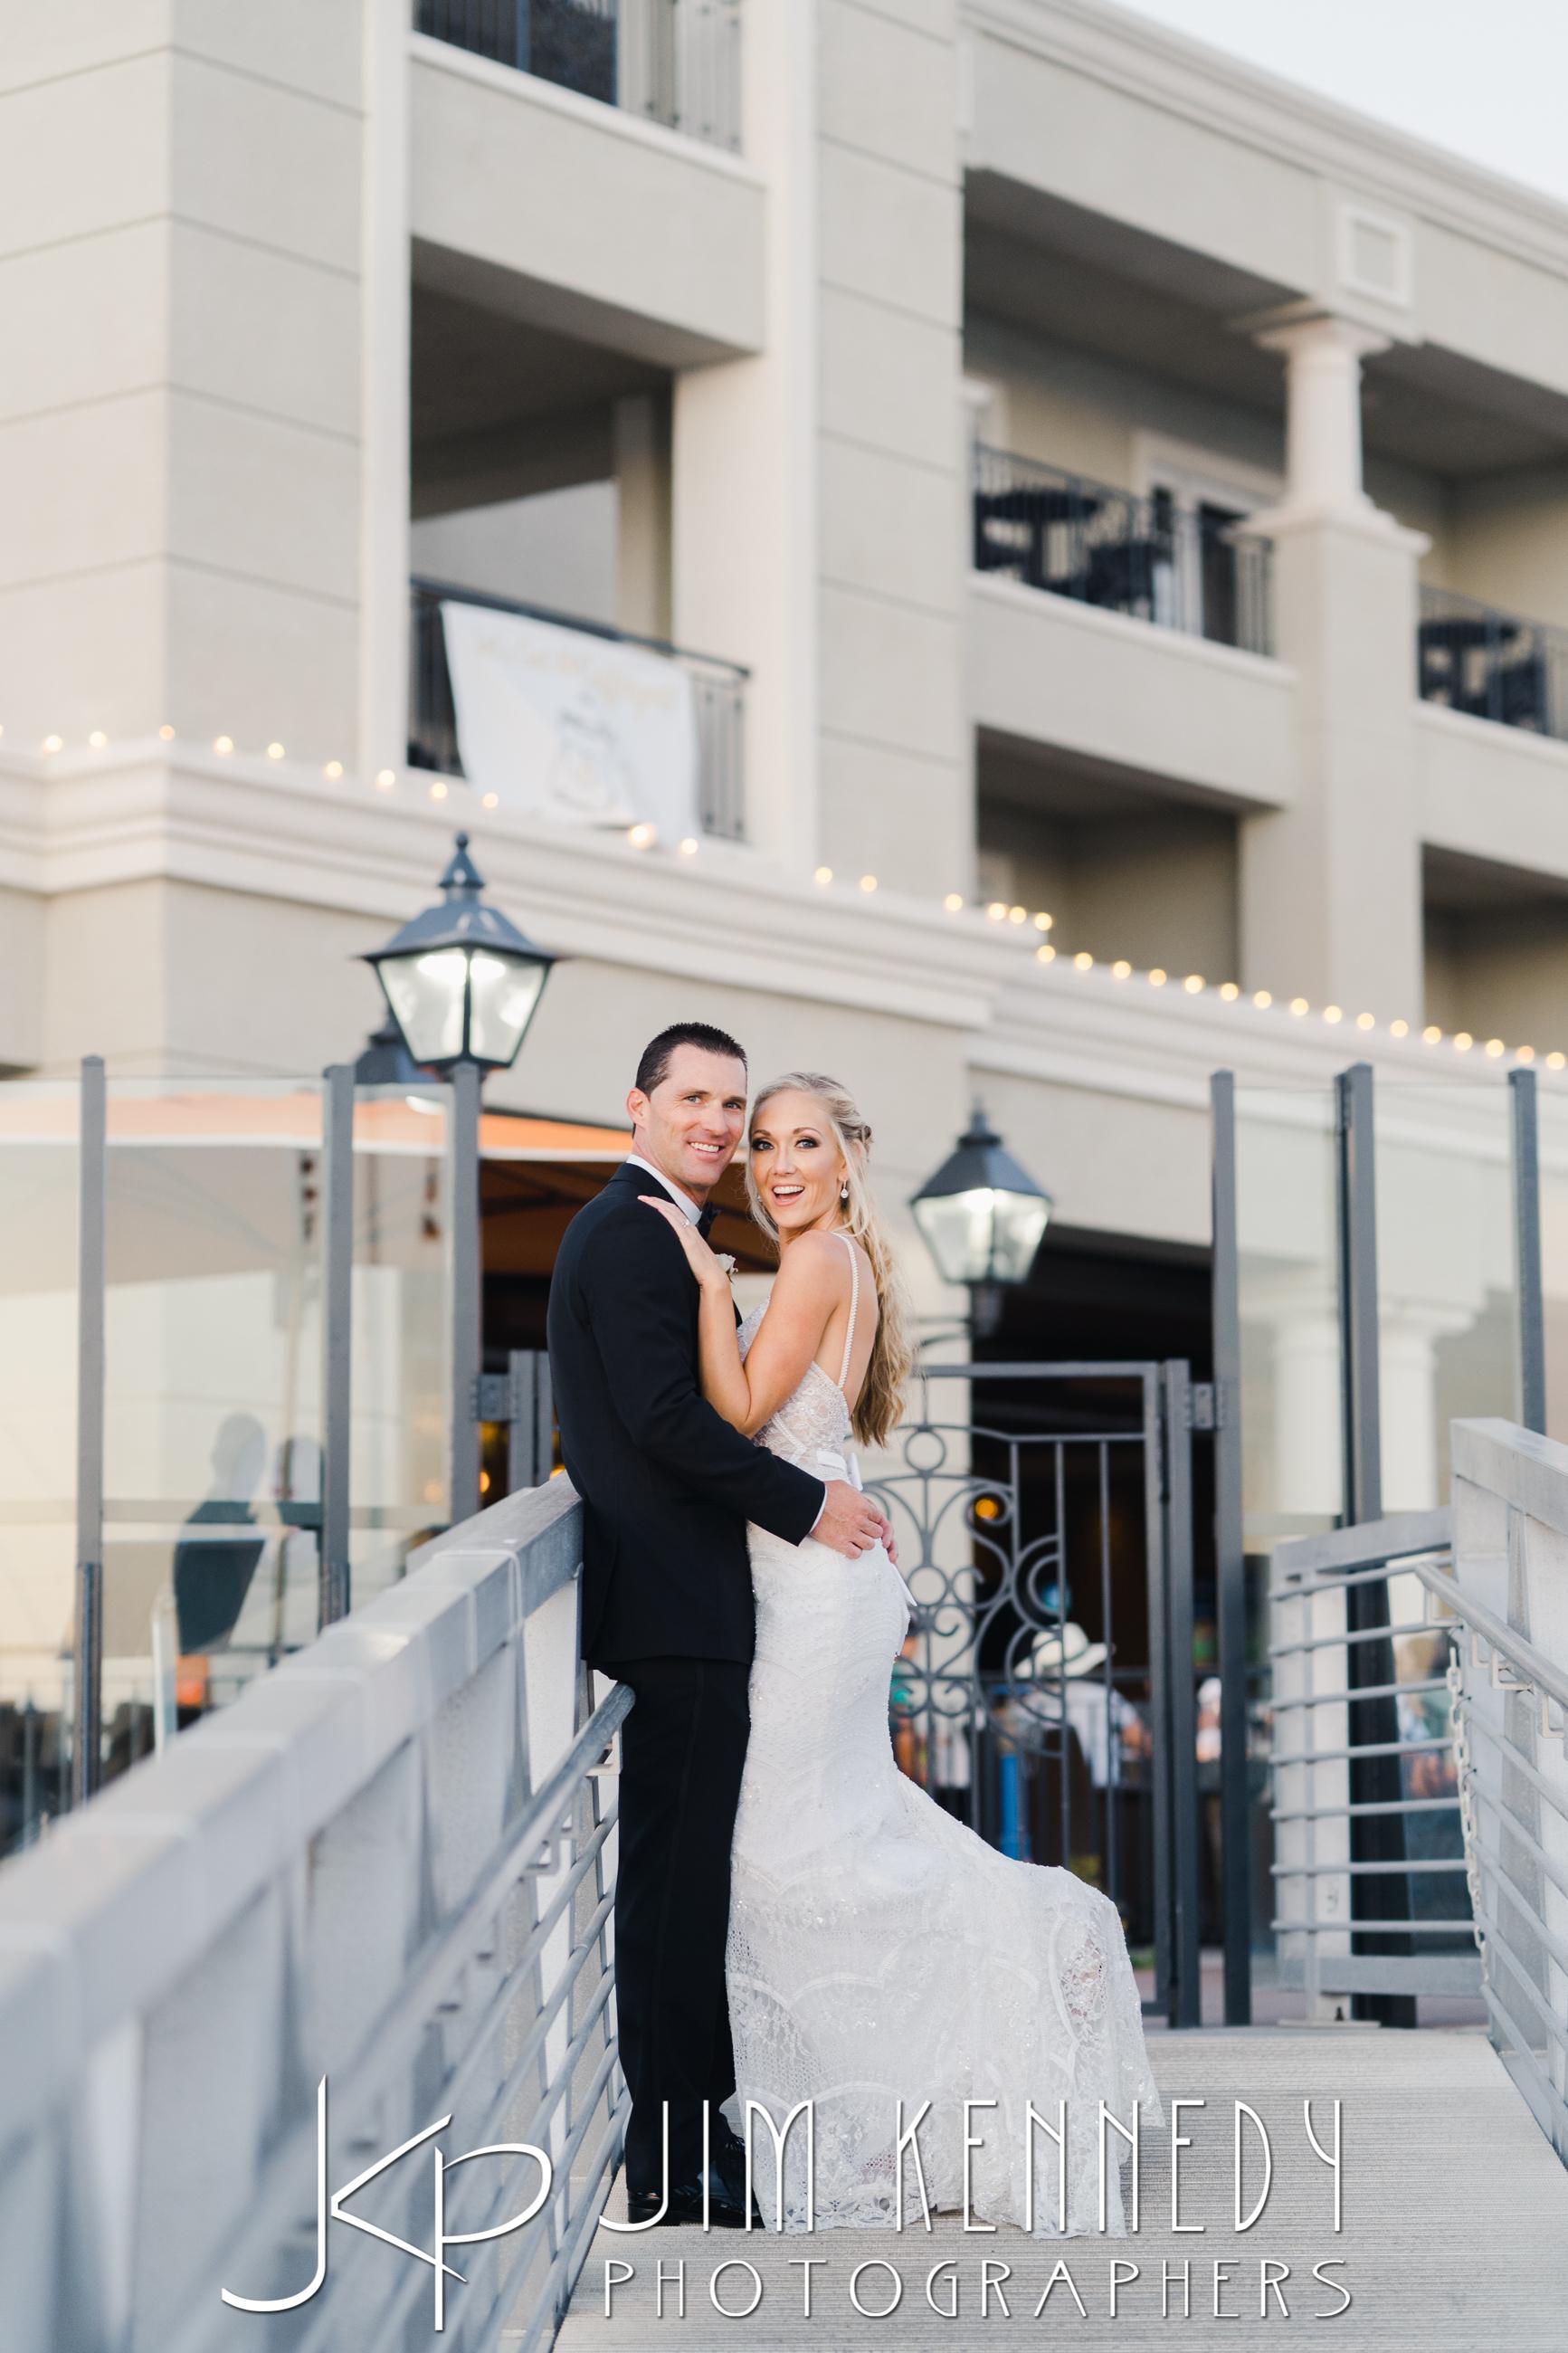 balboa-bay-resort-wedding-brooke-kevin_0158.JPG